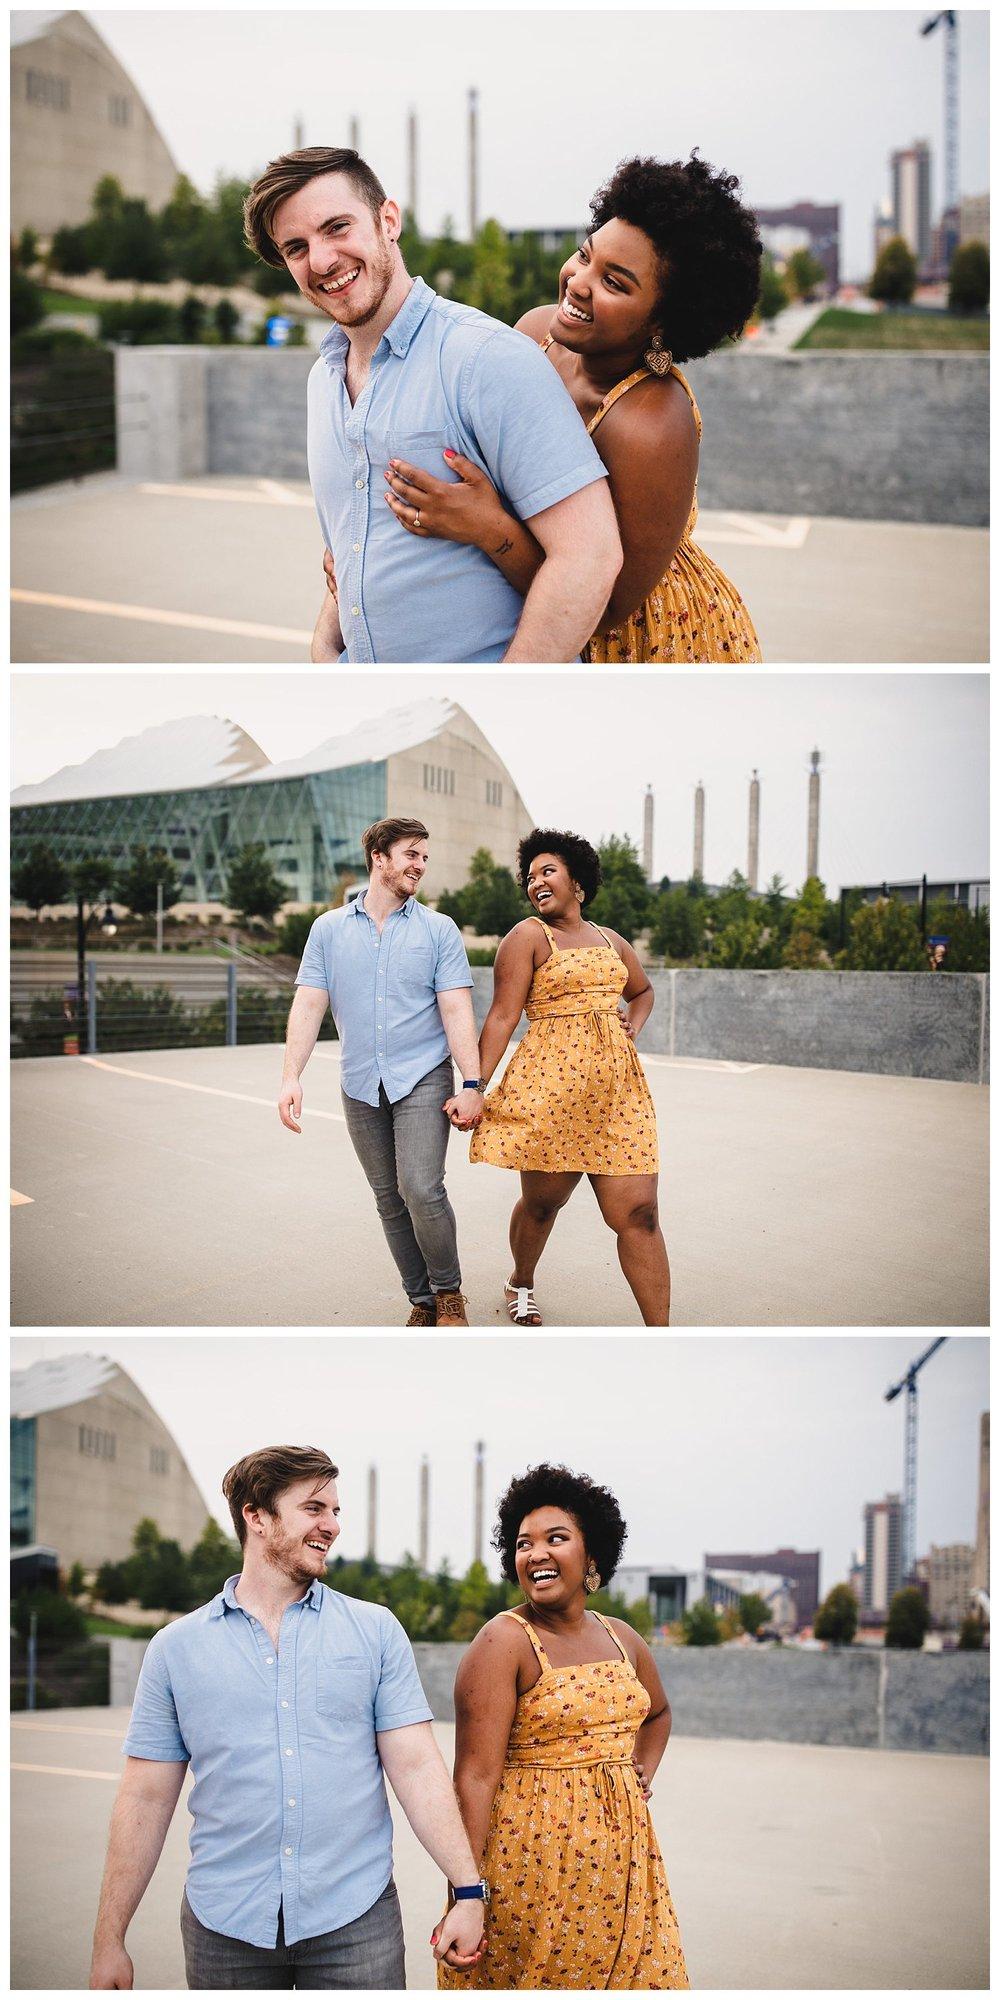 Kelsey_Diane_Photography_Kansas_City_Engagement_Wedding_Photographer_Midwest_Traveling_Missouri_Bri_Tyler_Arcade_Engagement_Up_Down_Kansas_City_Crossroads_District_0801.jpg